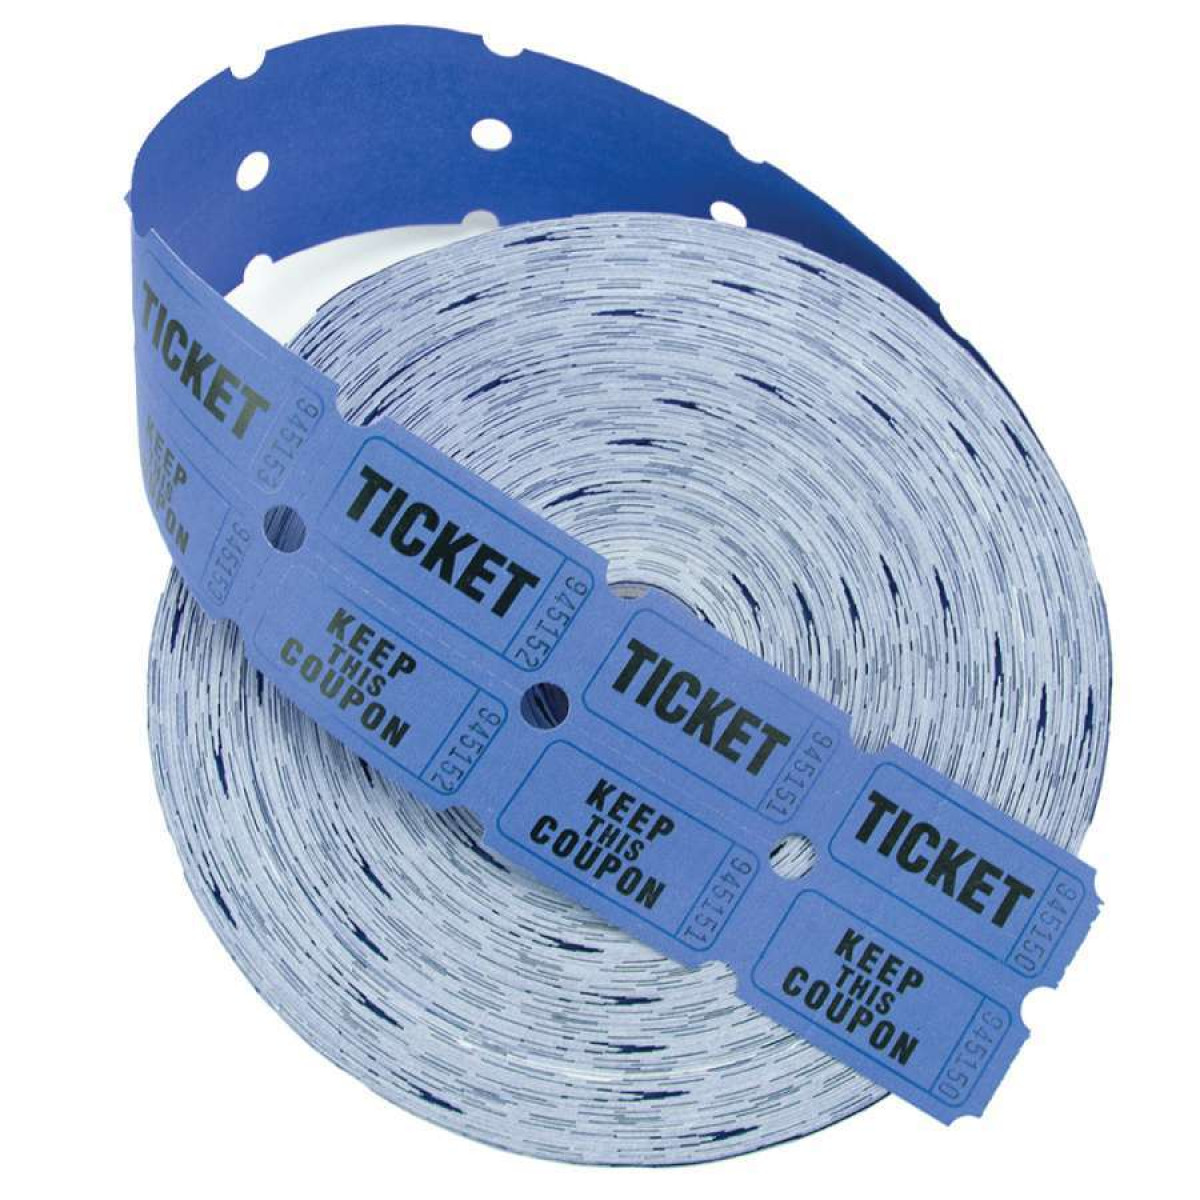 2 part raffle tickets